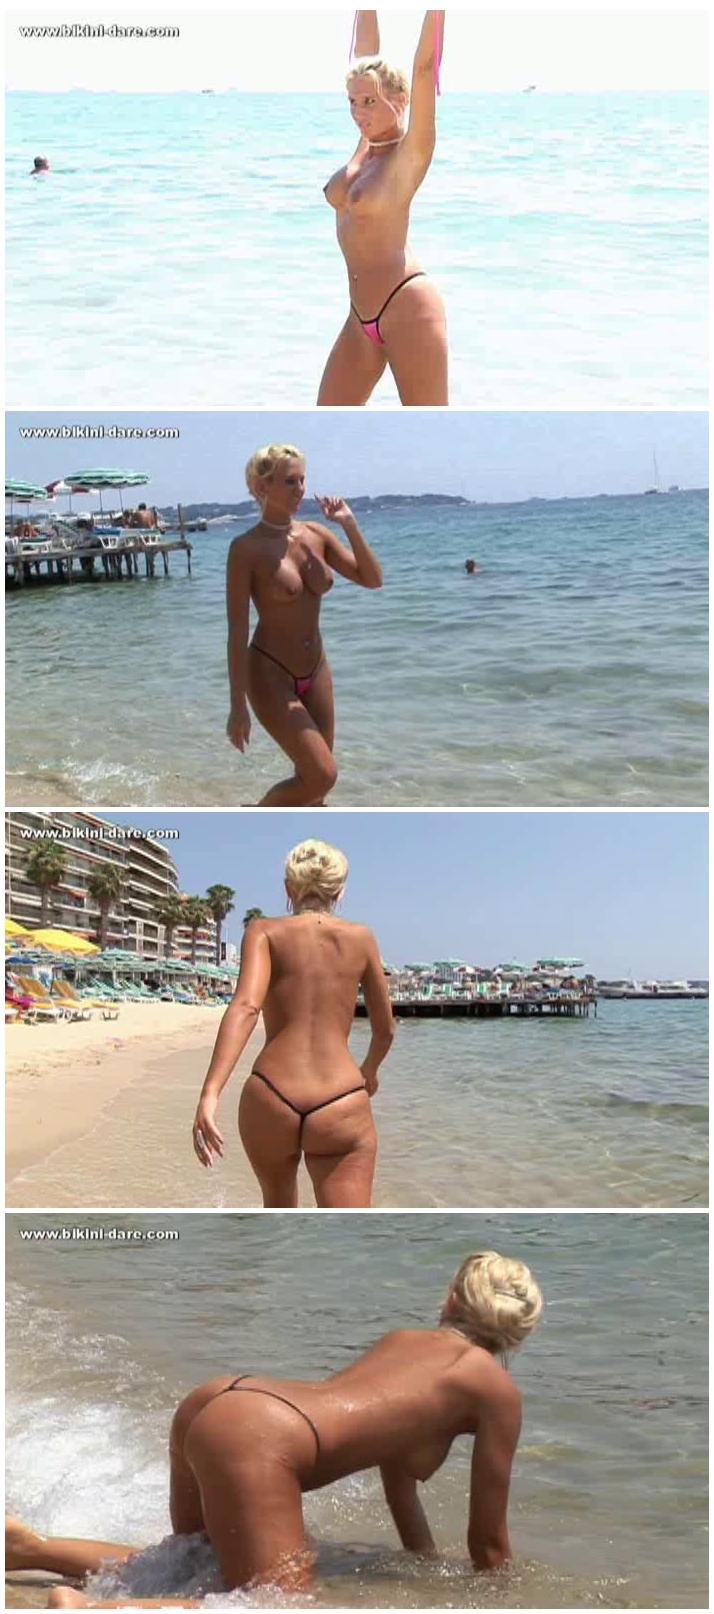 bikini-dare083_cover.jpg